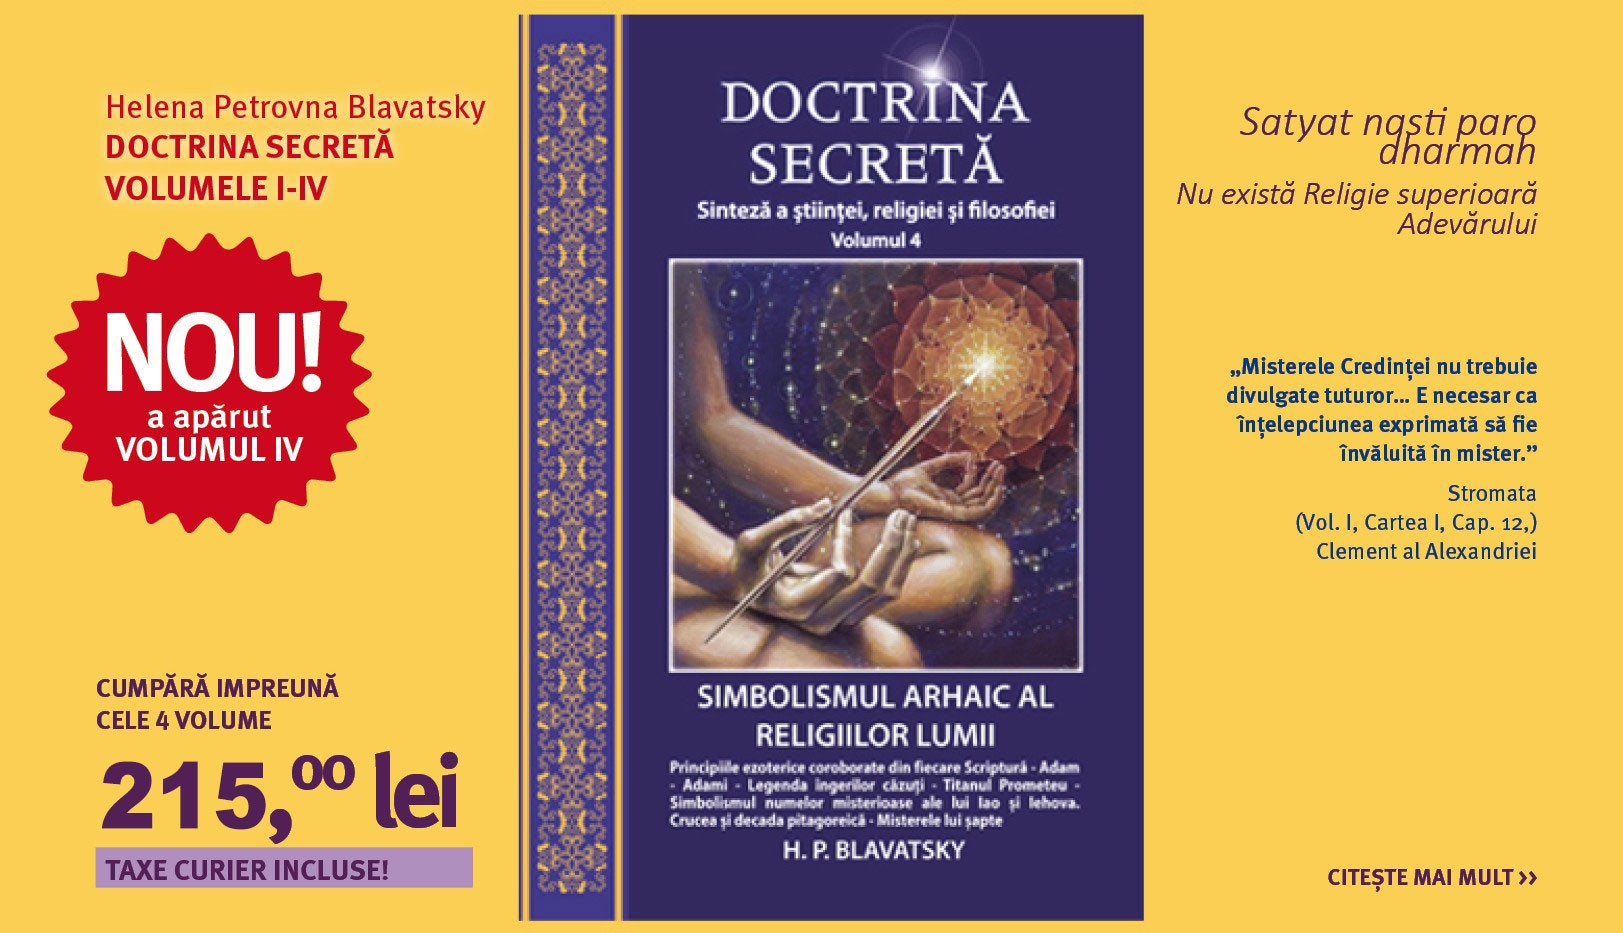 Doctrina Secreta